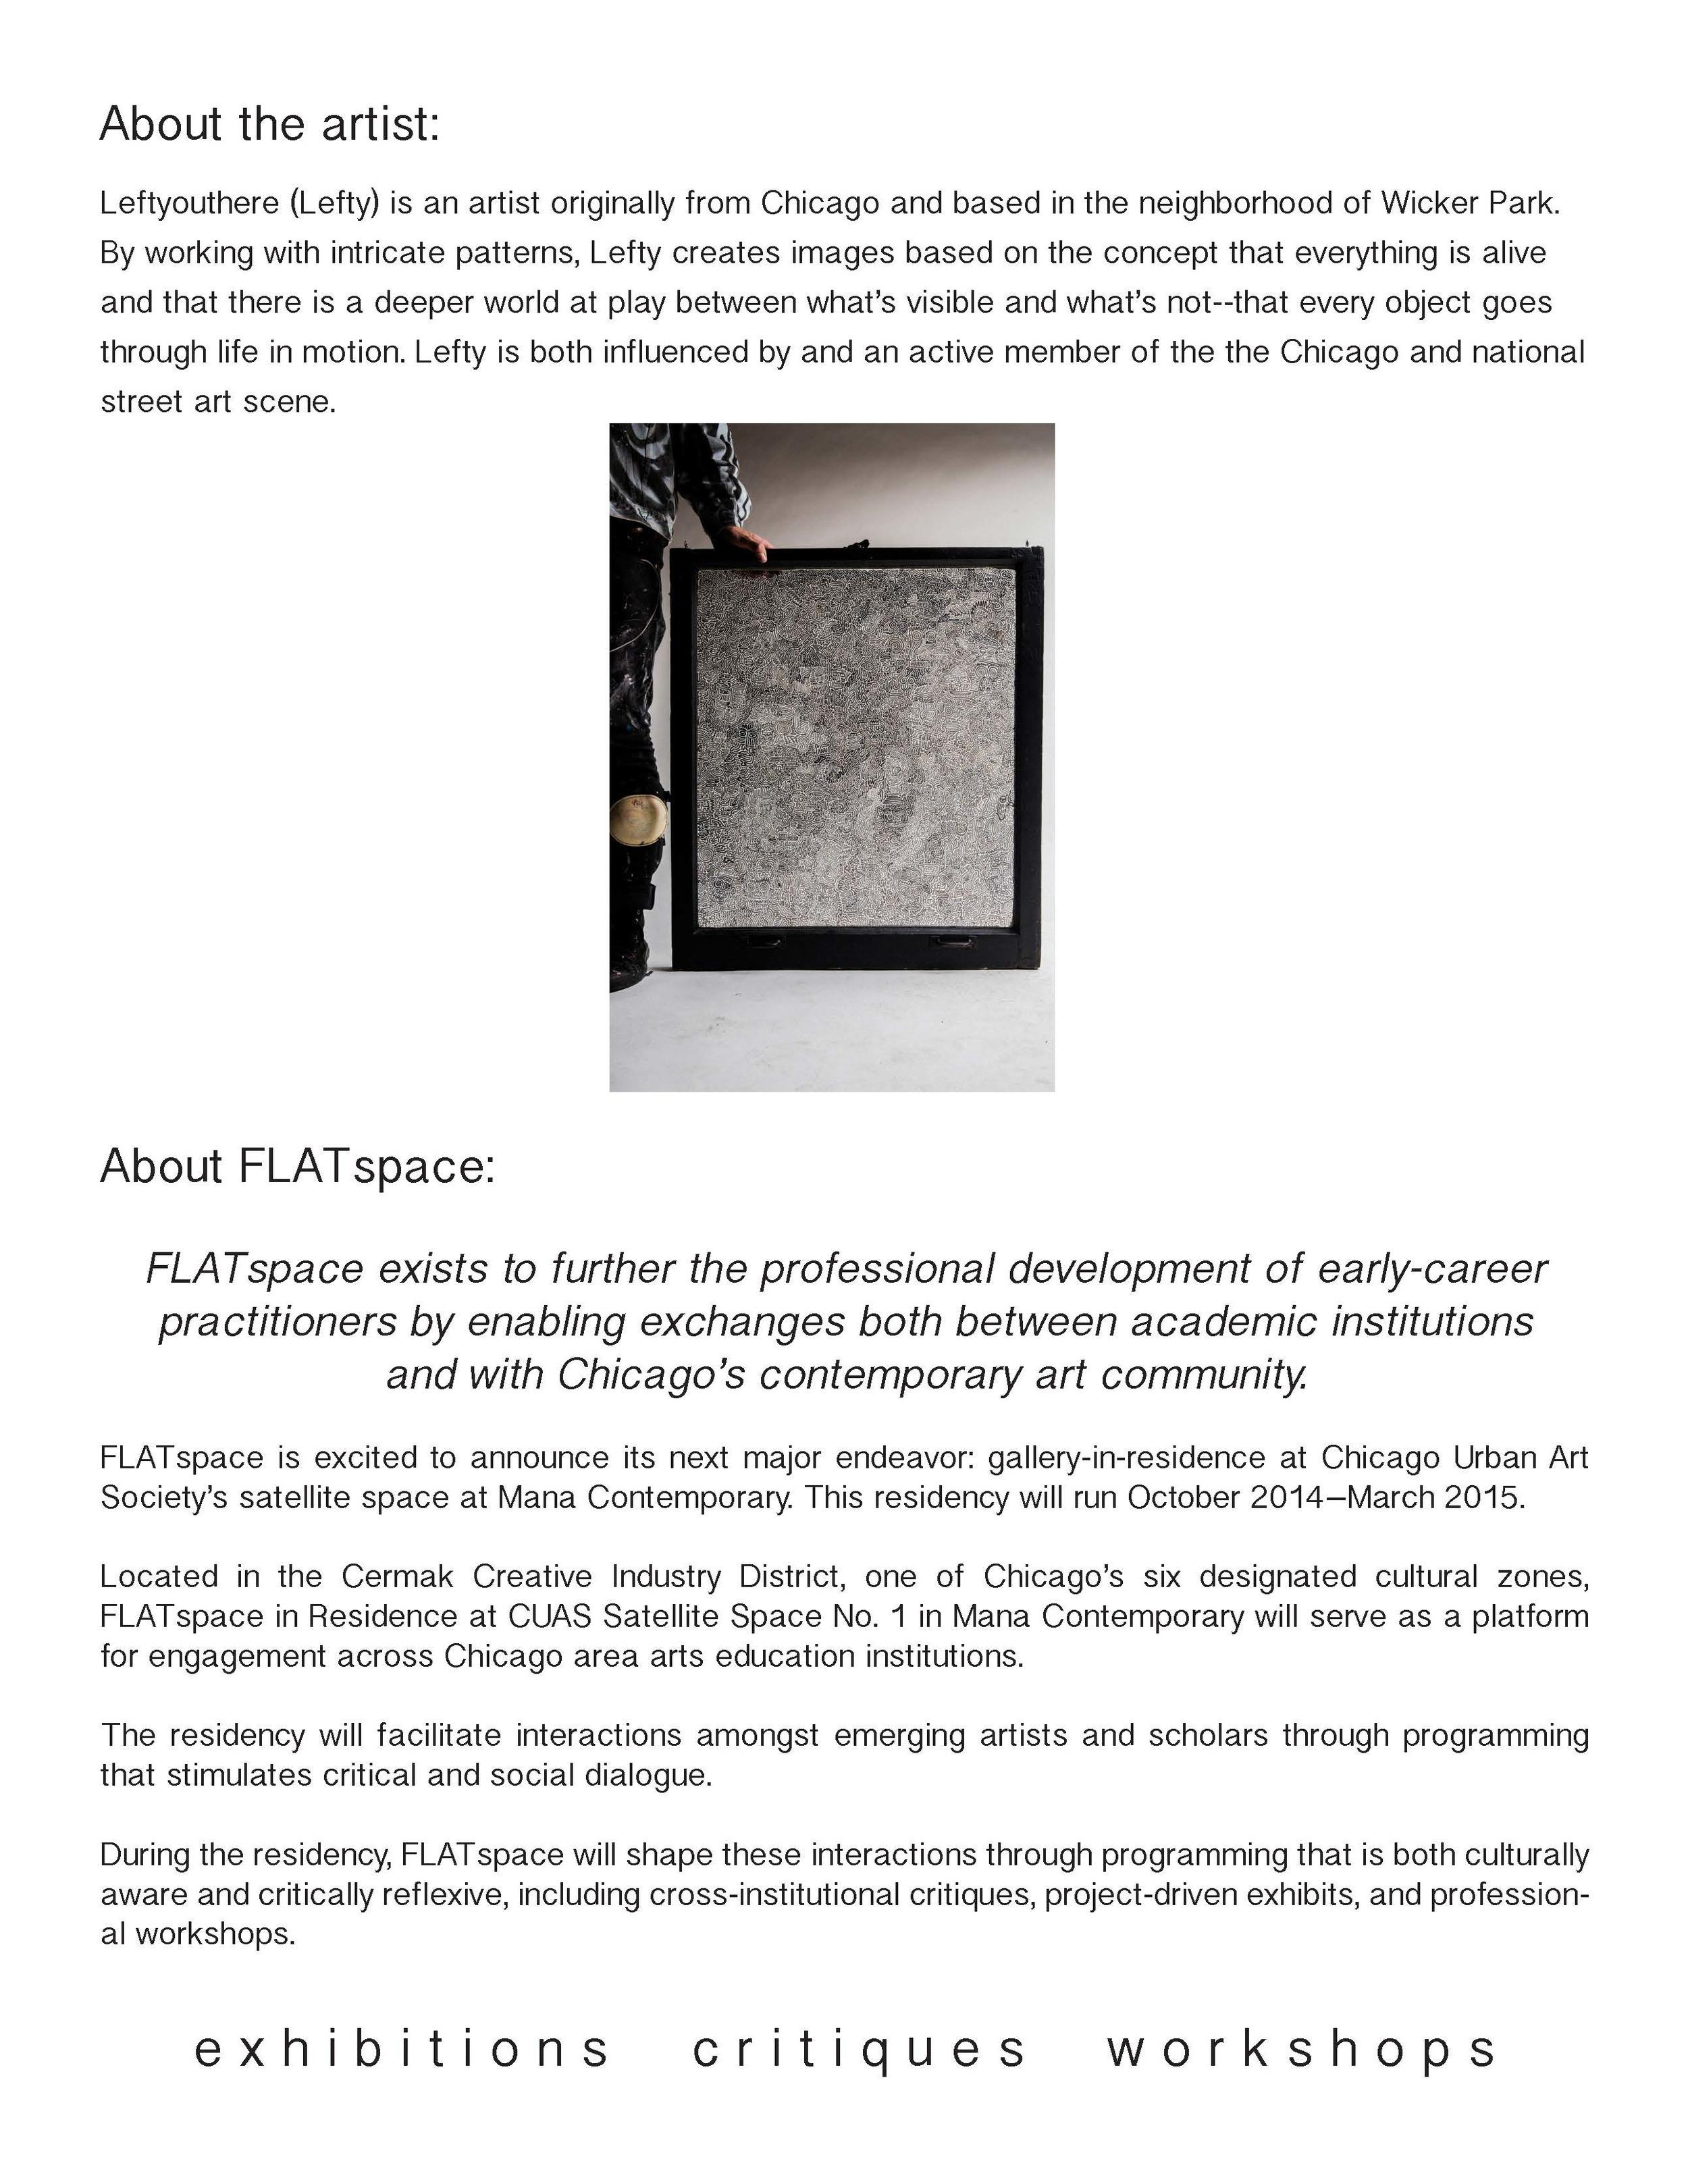 01162015_FLATspace_PR_Lefty (1)_Page_2.jpg